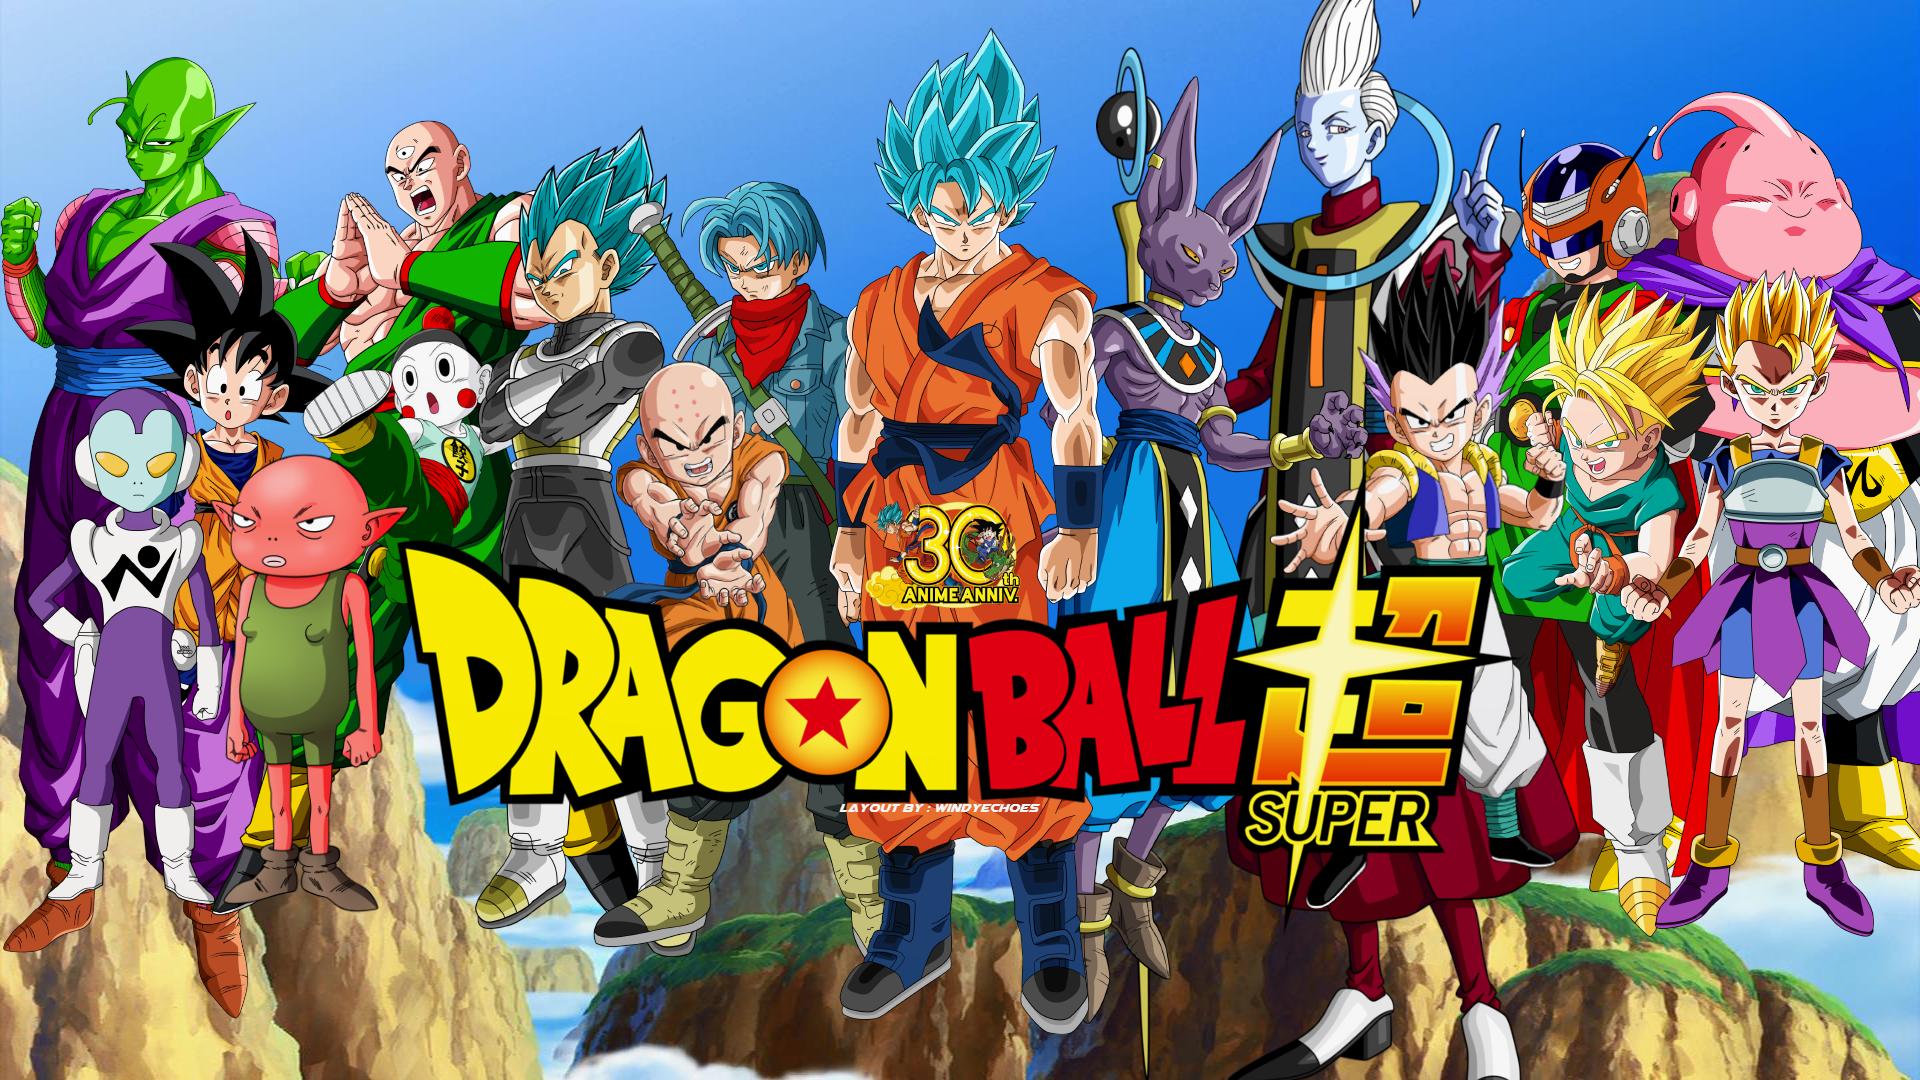 Dragon Ball Super HD Wallpaper   Background Image   1920x1080   ID:772385 - Wallpaper Abyss